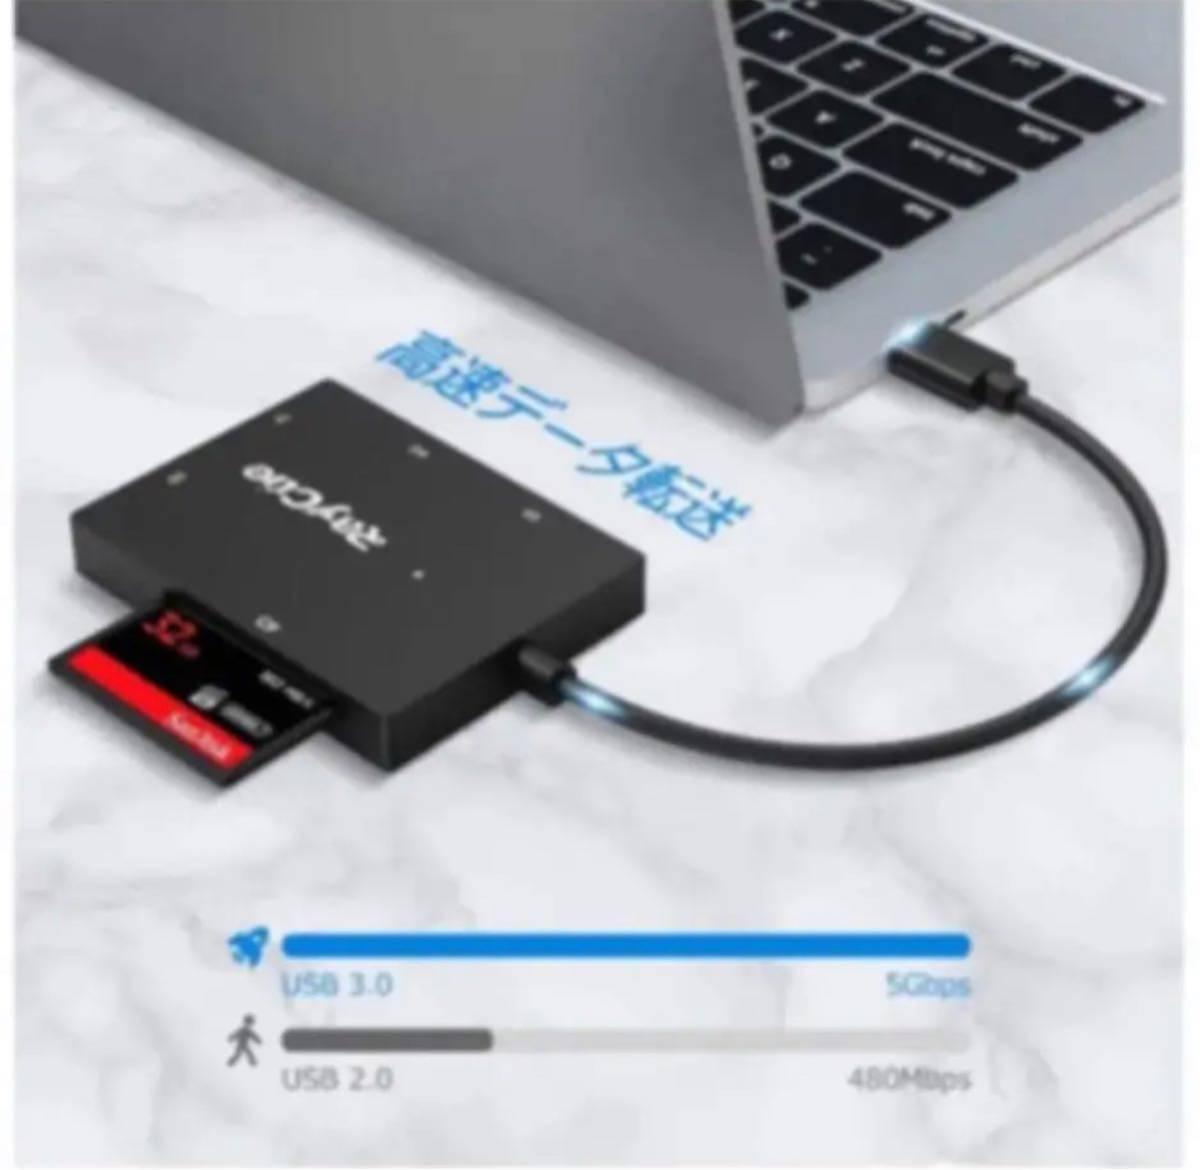 CF カード リーダー USB 3.0 SD カード リーダー